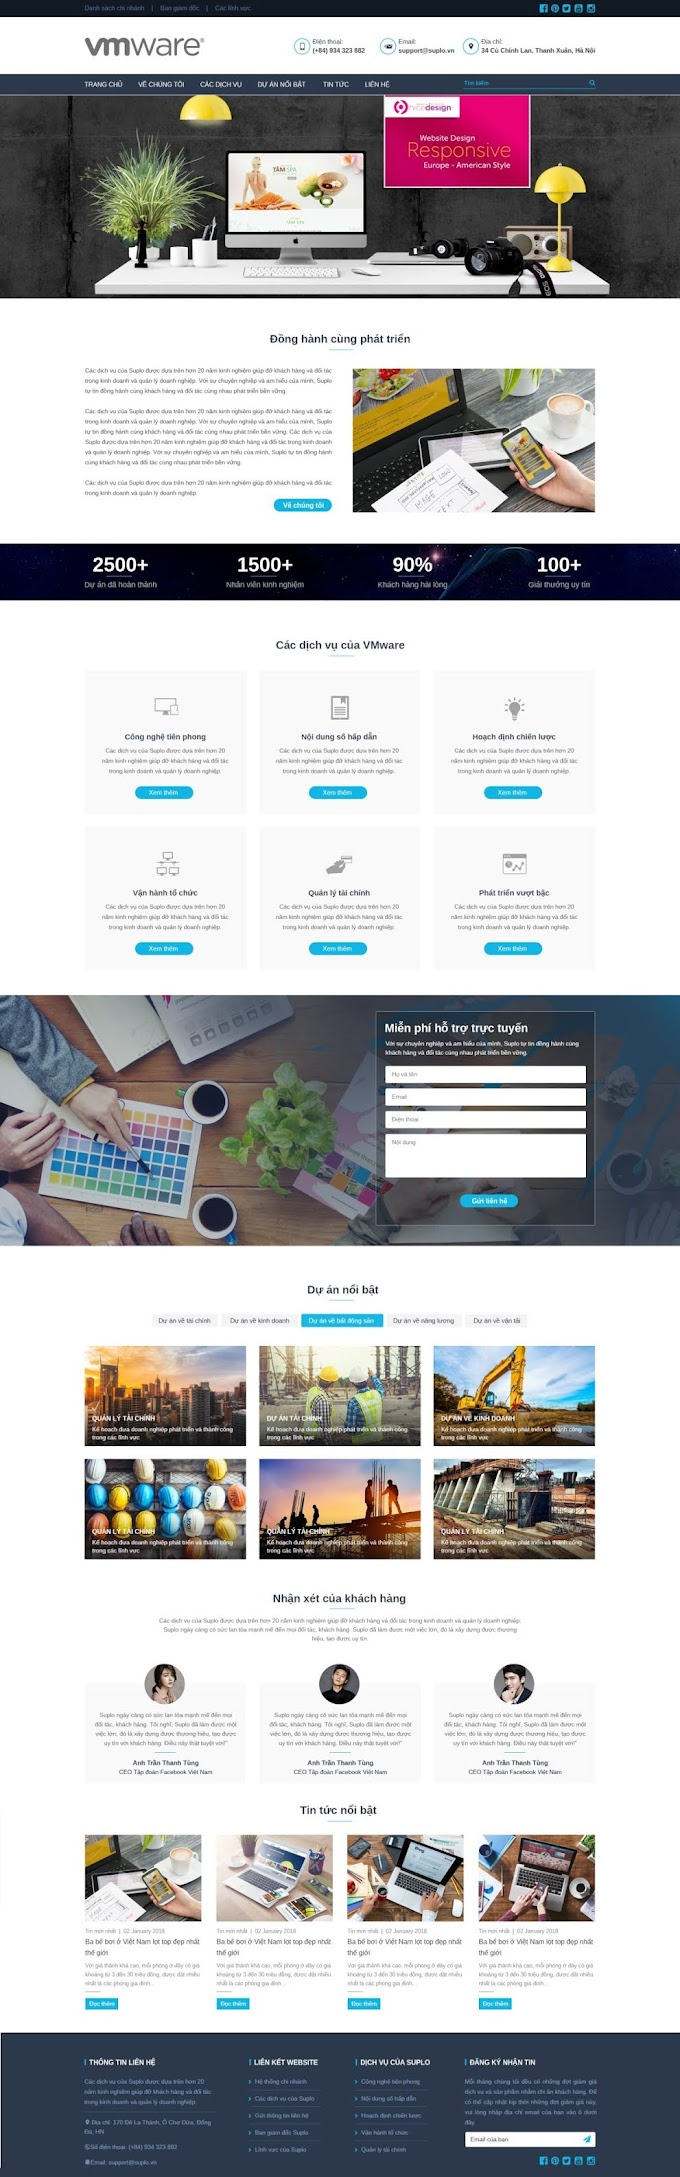 Mẫu website dịch vụ hot 2020